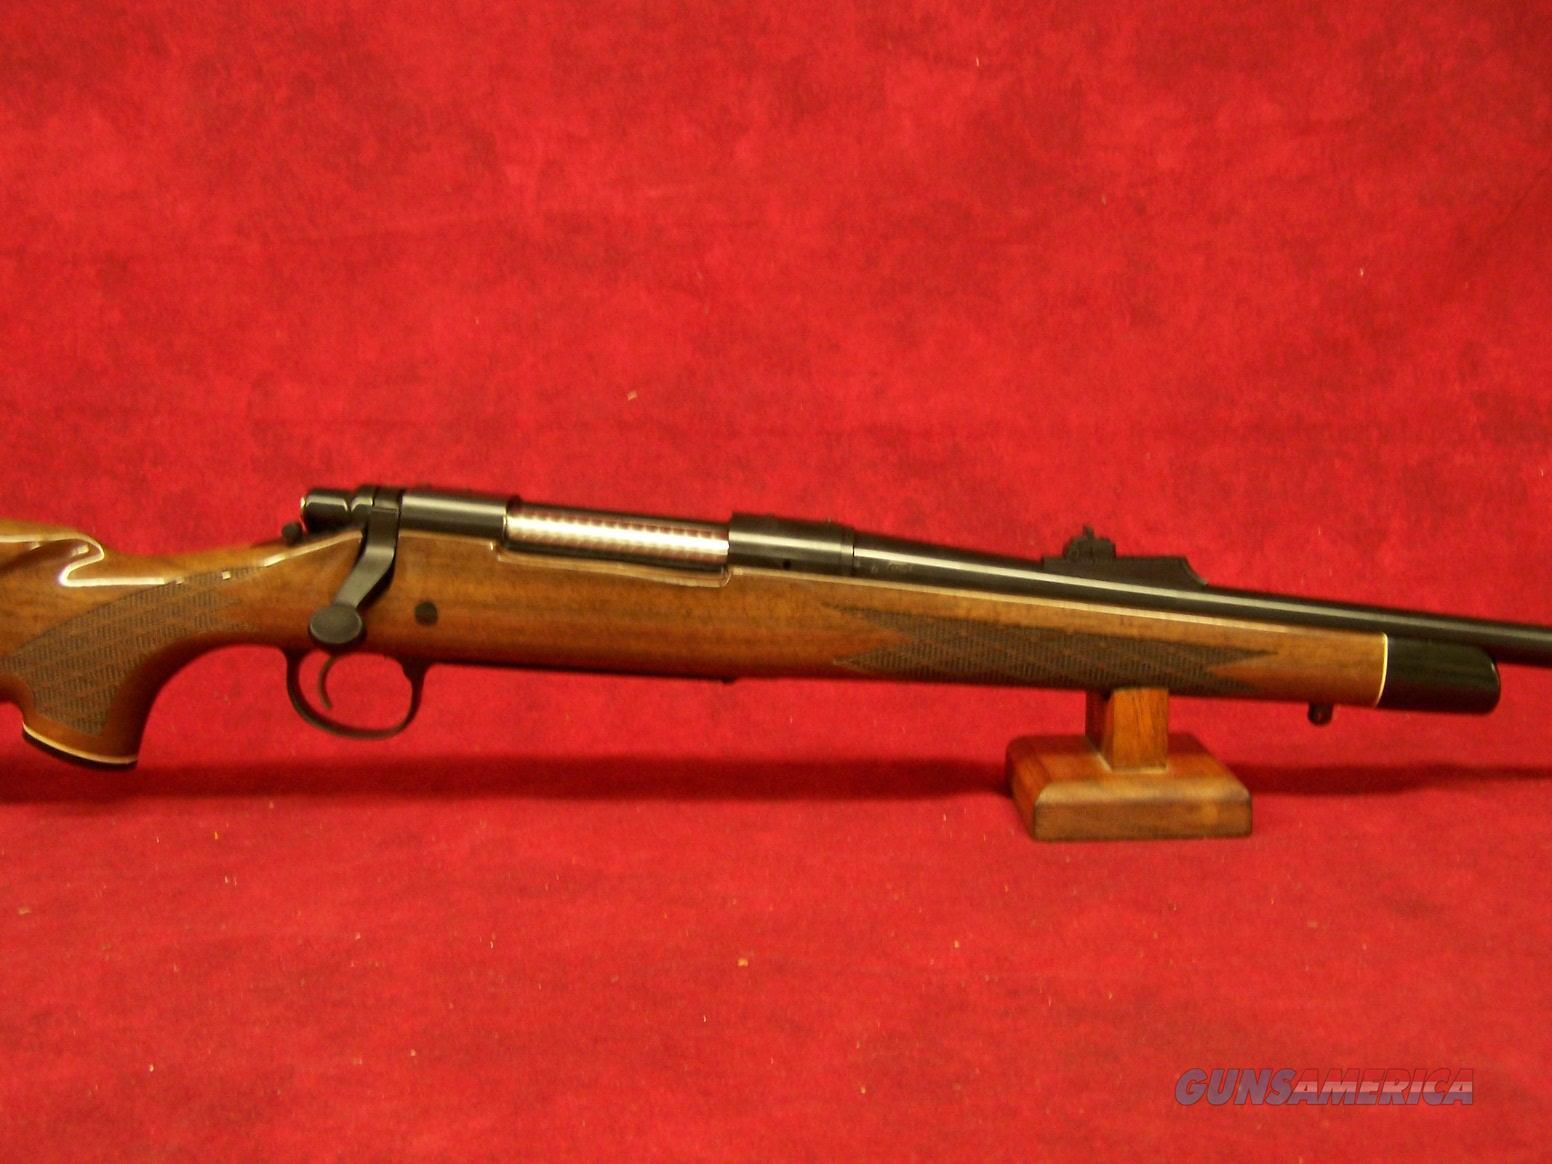 "Remington 700 BDL .270 Win 22"" Barrel X-Mark Pro Trigger Blue Finish American Walnut Stock (25791)  Guns > Rifles > Remington Rifles - Modern > Model 700 > Sporting"